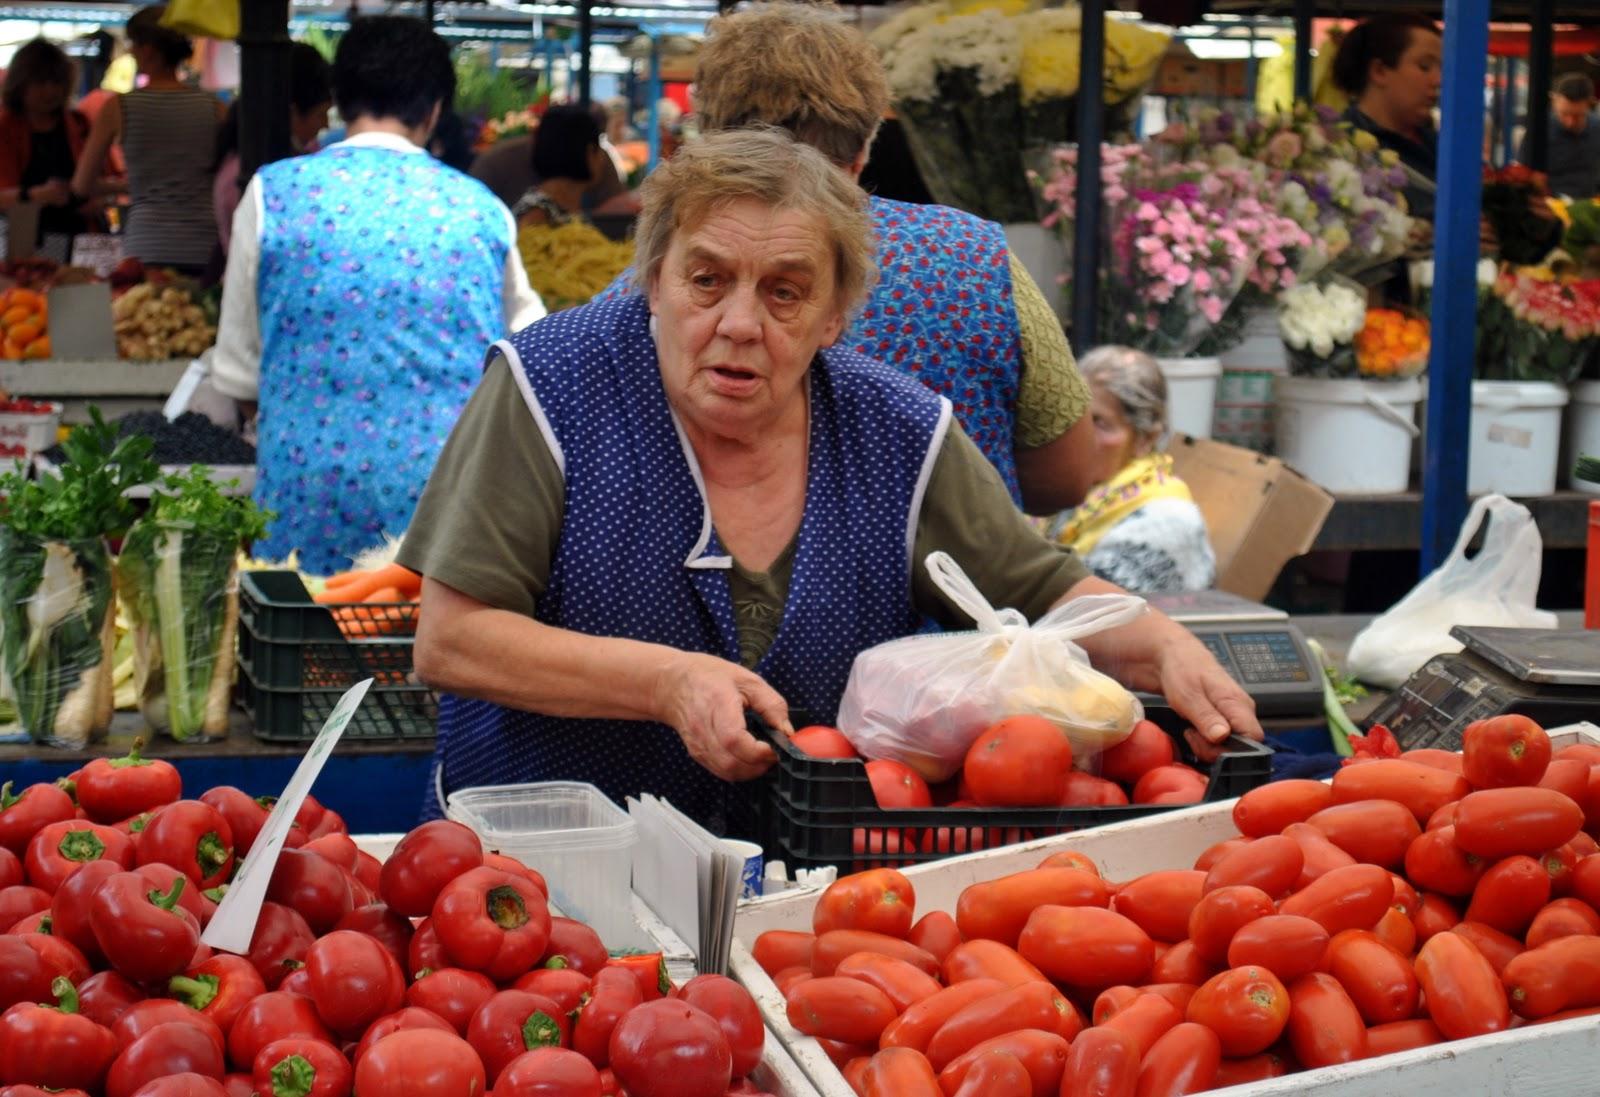 Market in Krakow